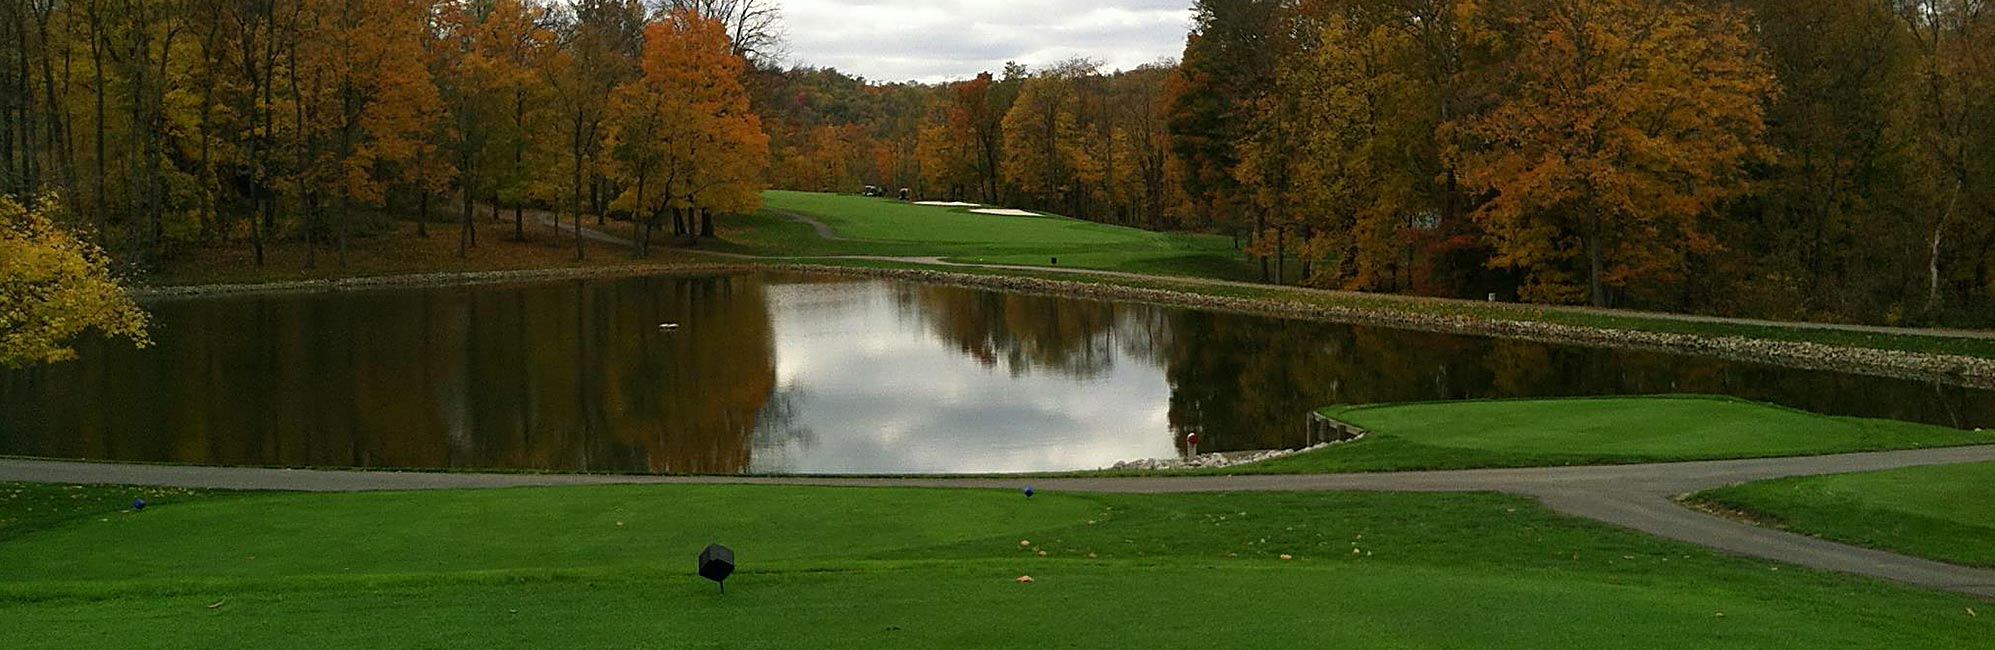 Lindenwood Golf Club - Canonsburg, PA